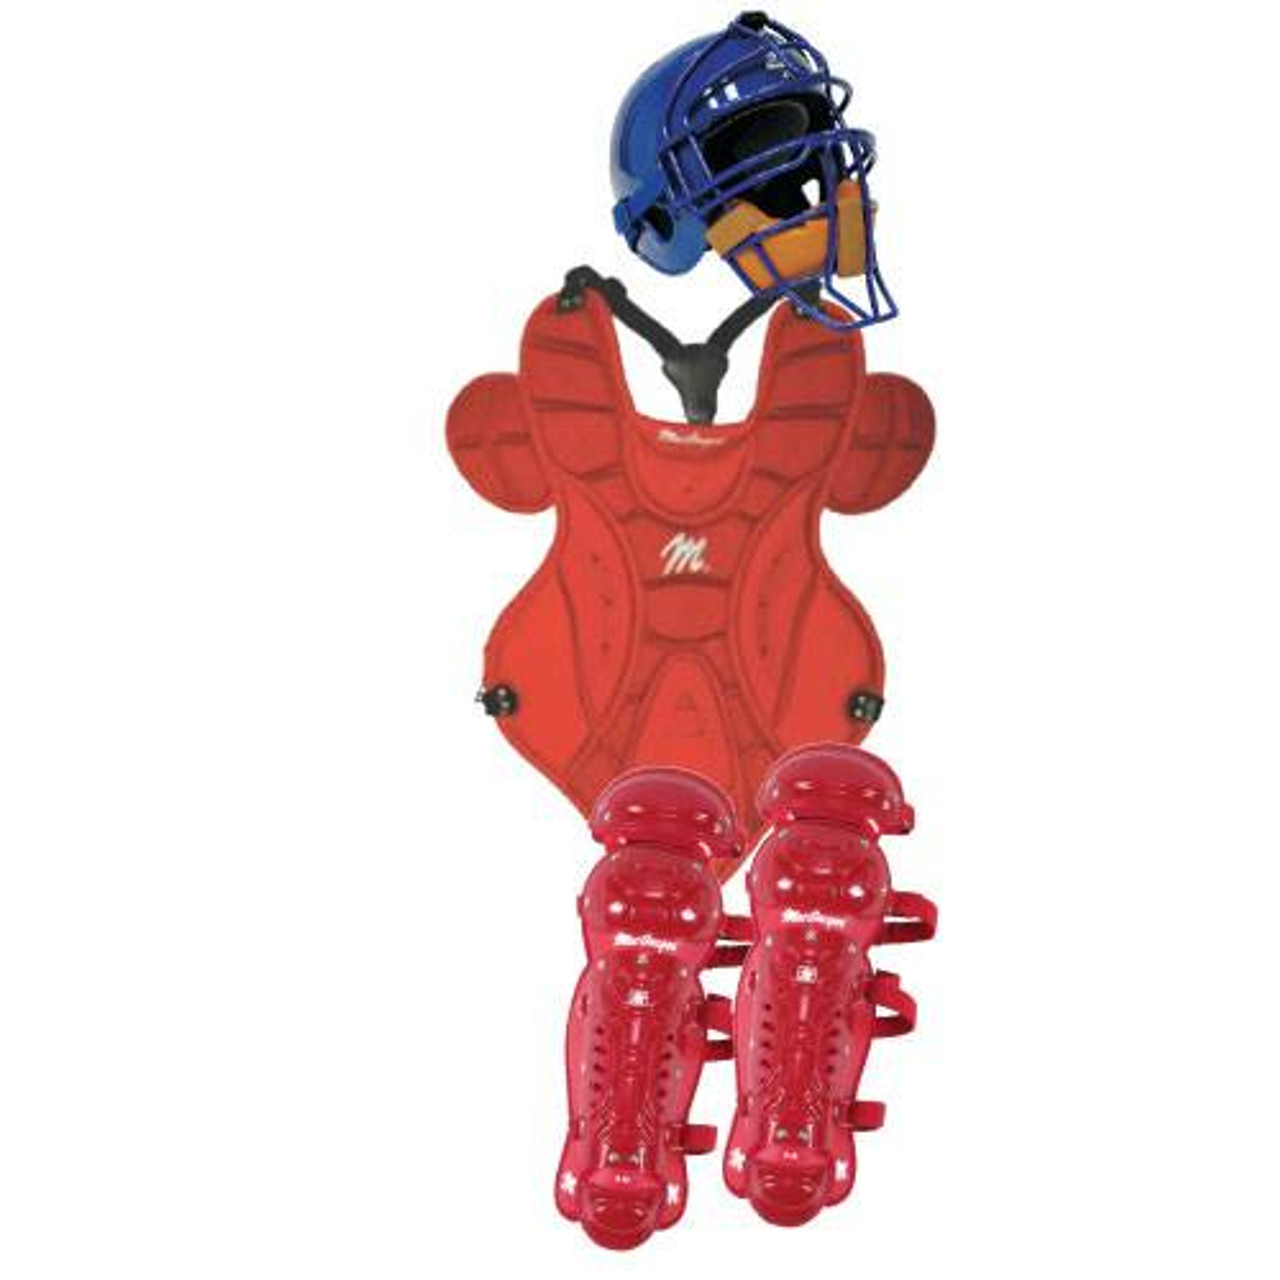 MacGregor baseball Junior Catcher's Gear Pack